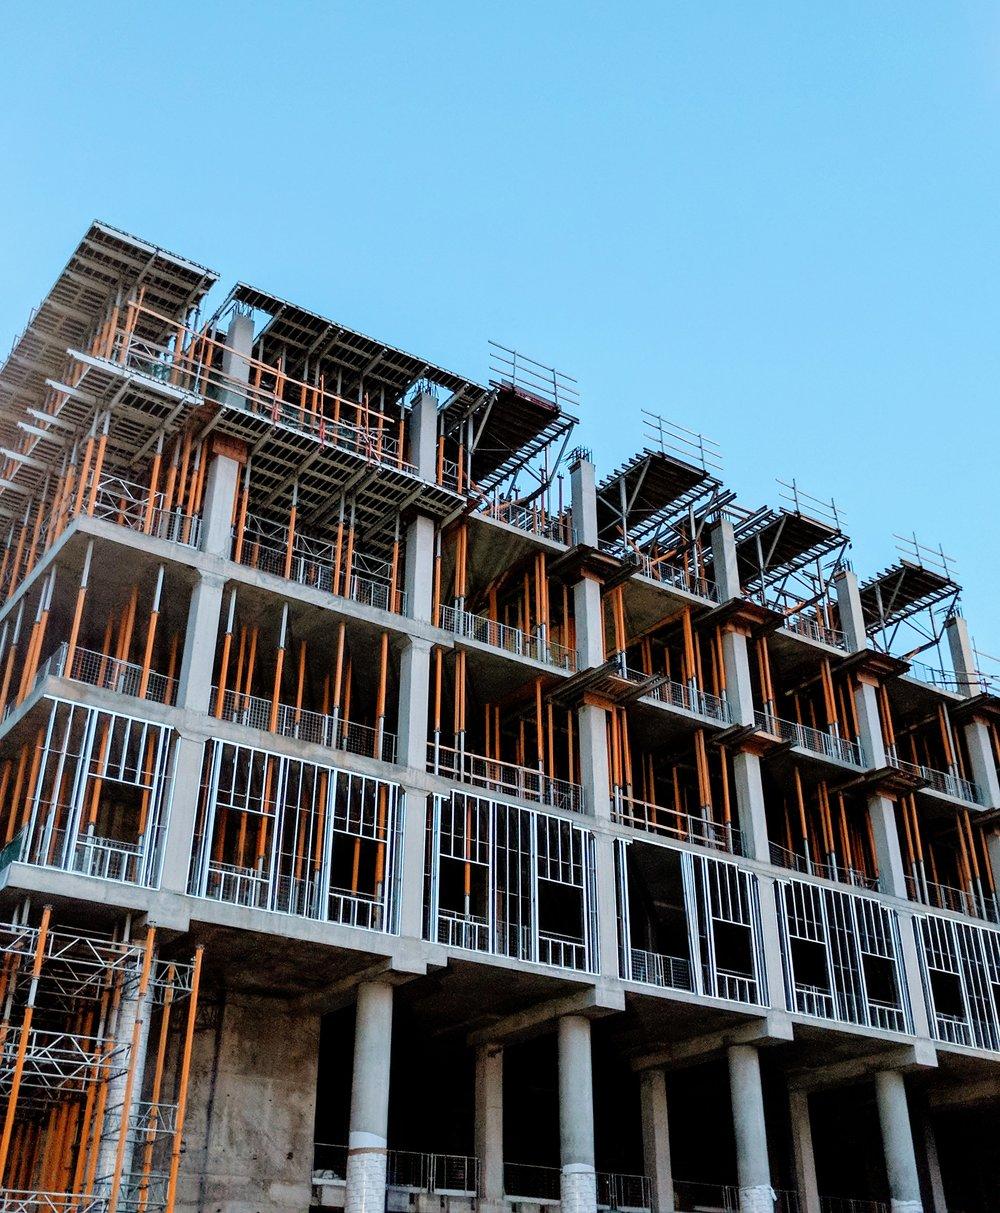 APARTMENT BUILDING \ NEW CONSTRUCTION \ ASTORIA, NY